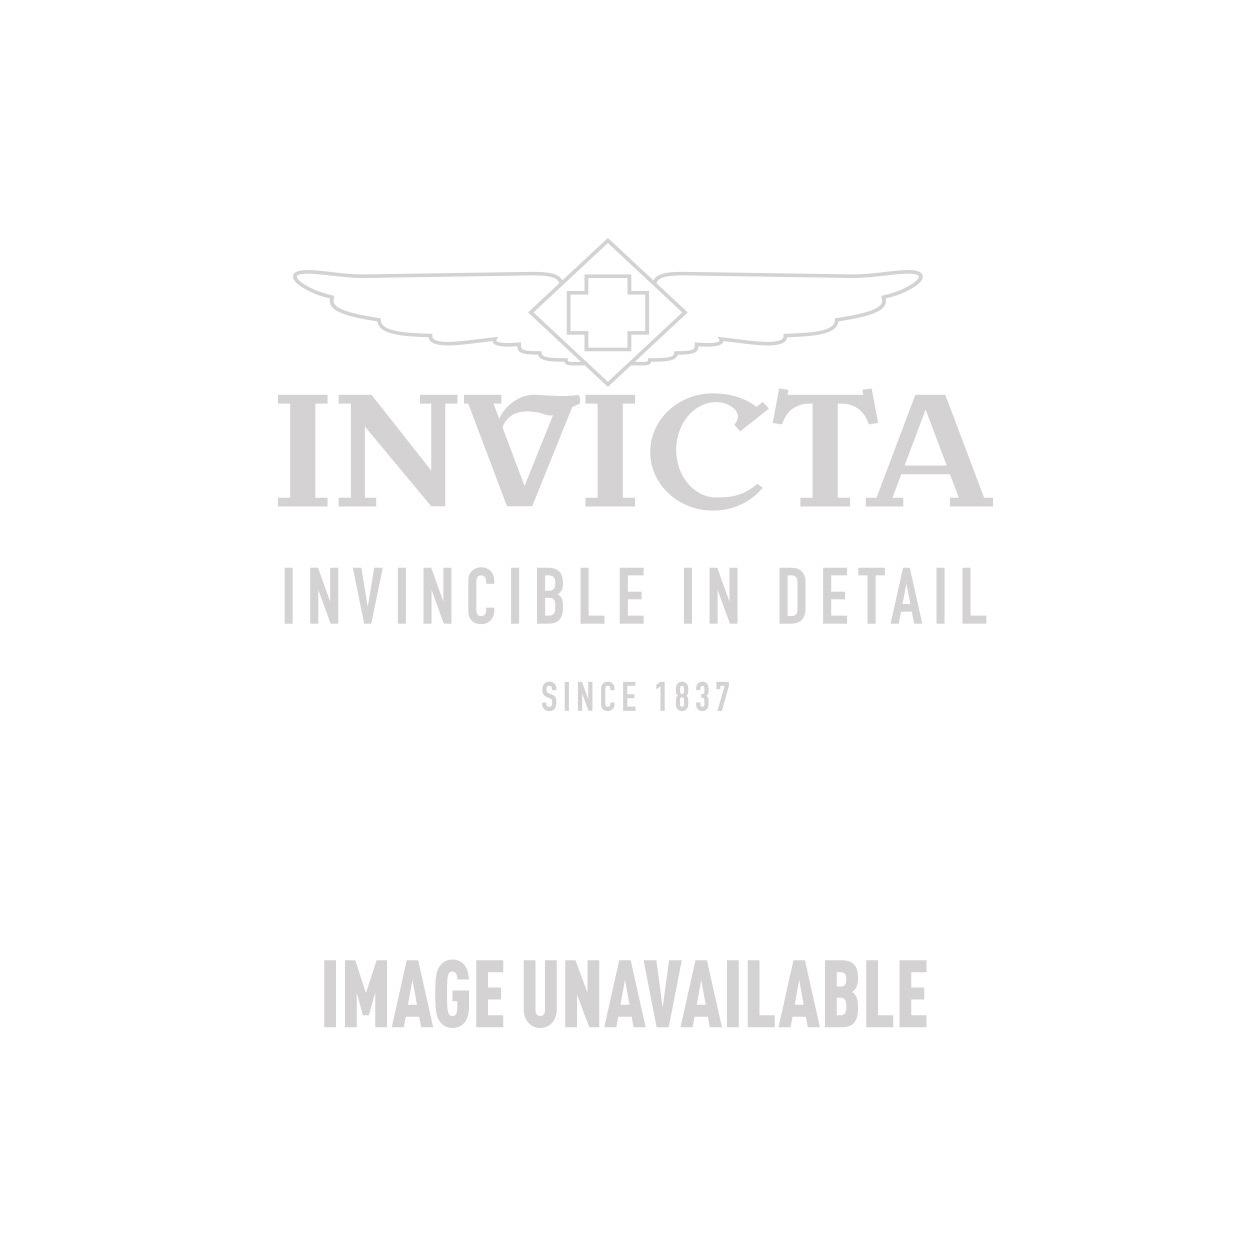 Invicta Pro Diver Scuba Quartz Watch Stainless Steel